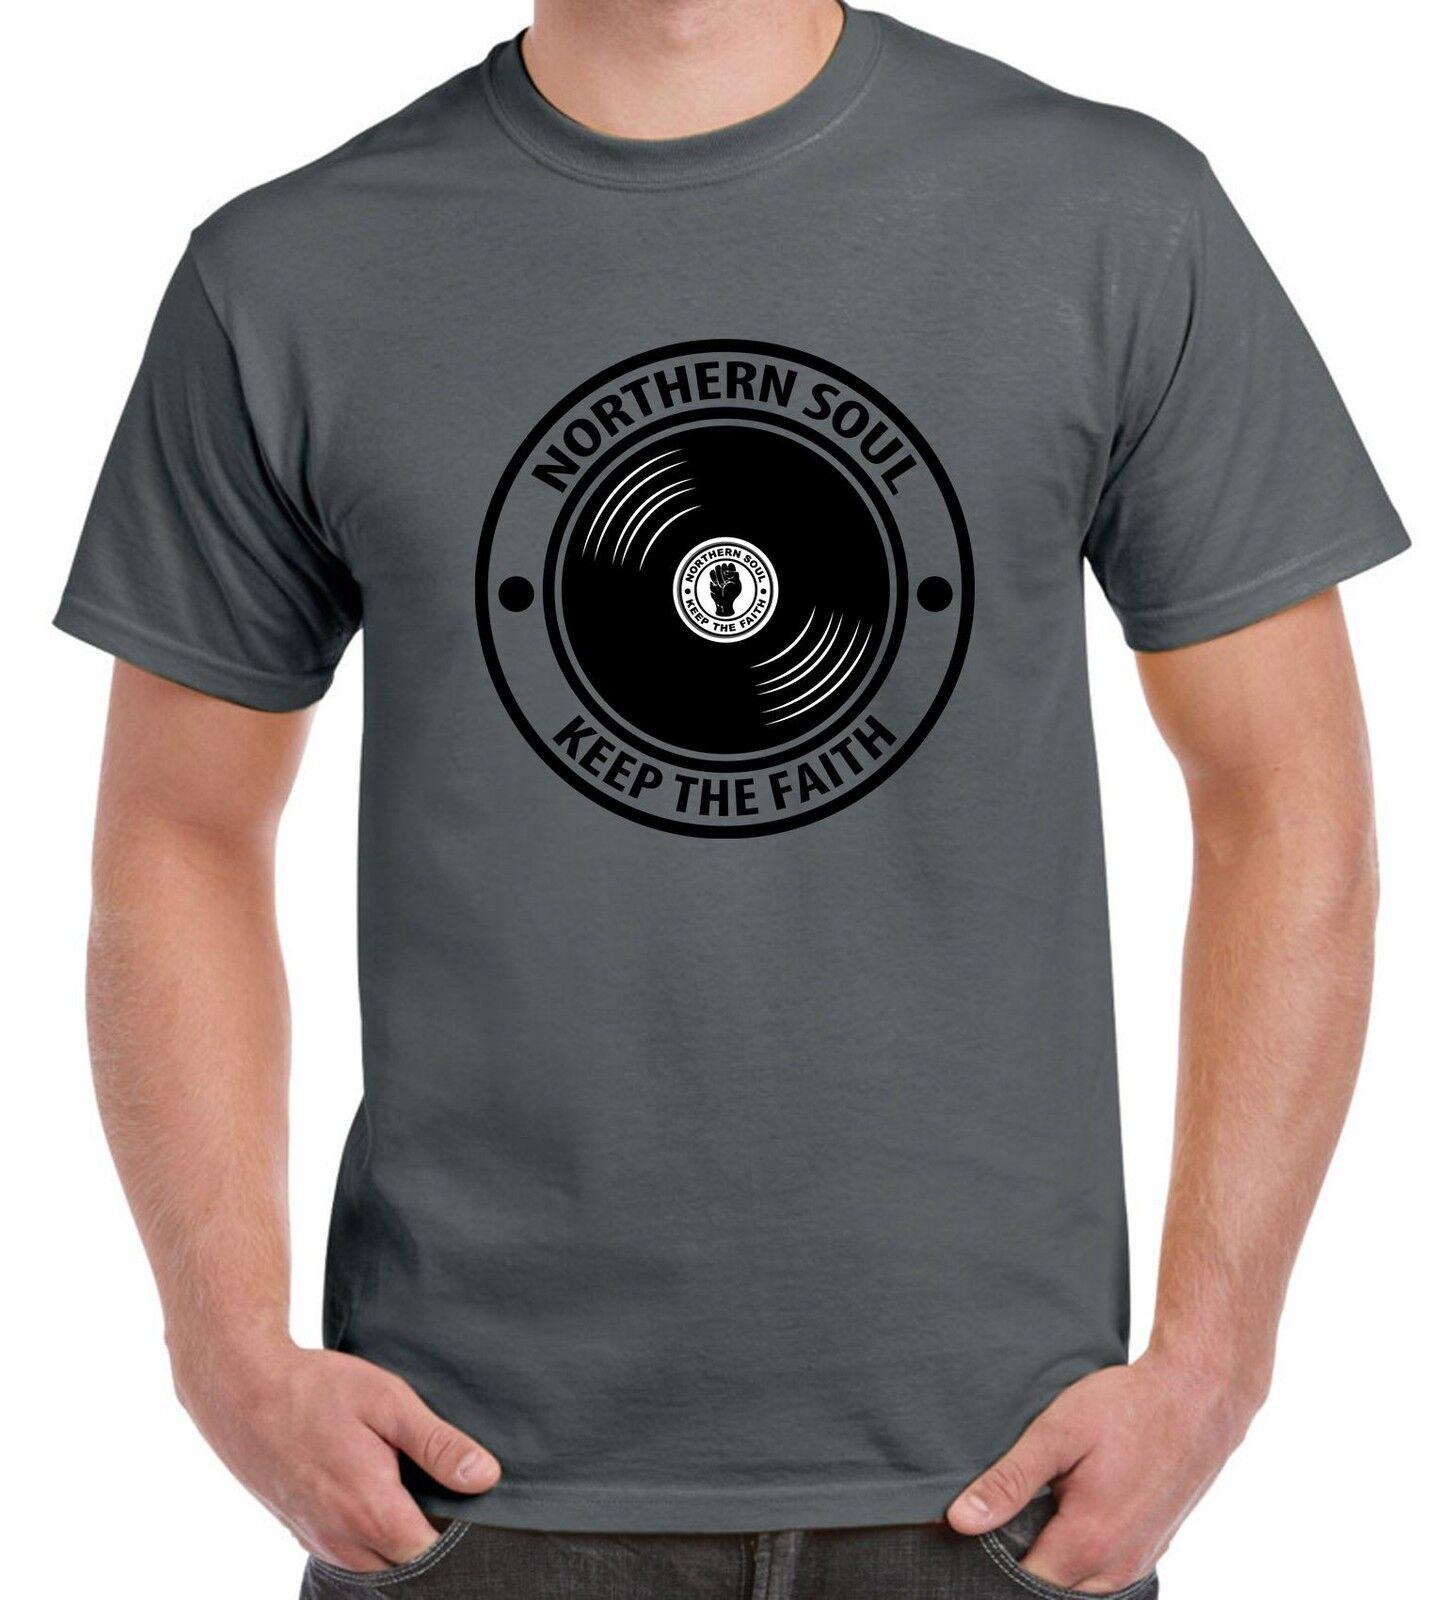 Wigan Casino Mod Northern Soul Dance Floor Keep The Faith Long Sleeve T-shirt